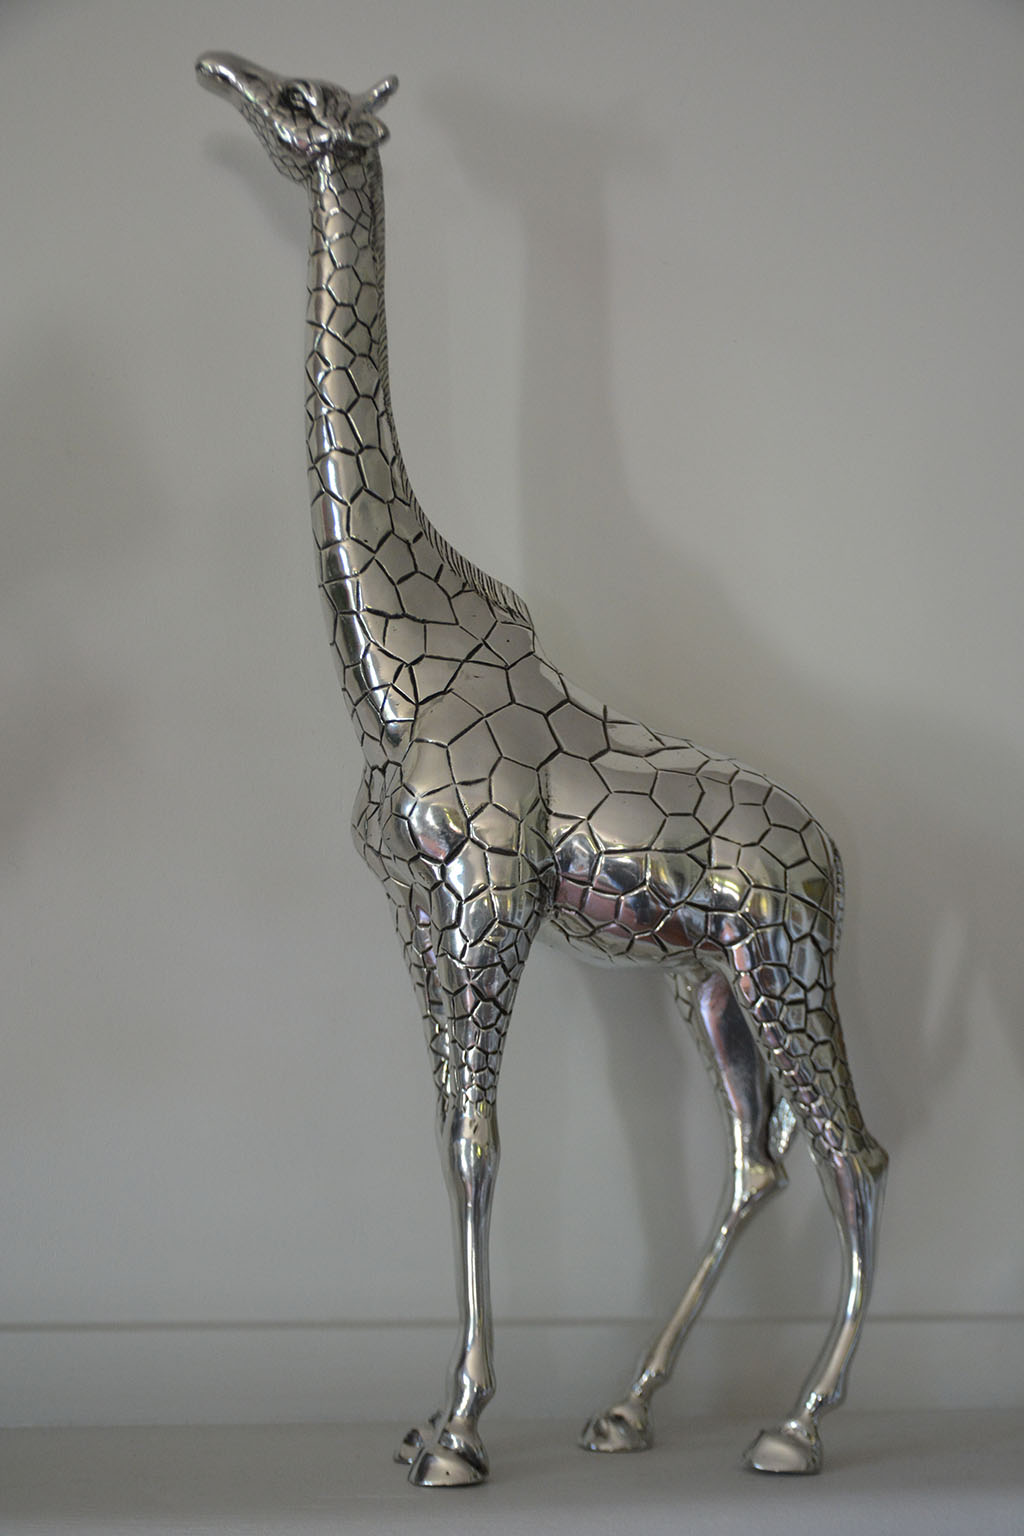 cadeau girafe decorative ht 47cm girafe aspect argent massif